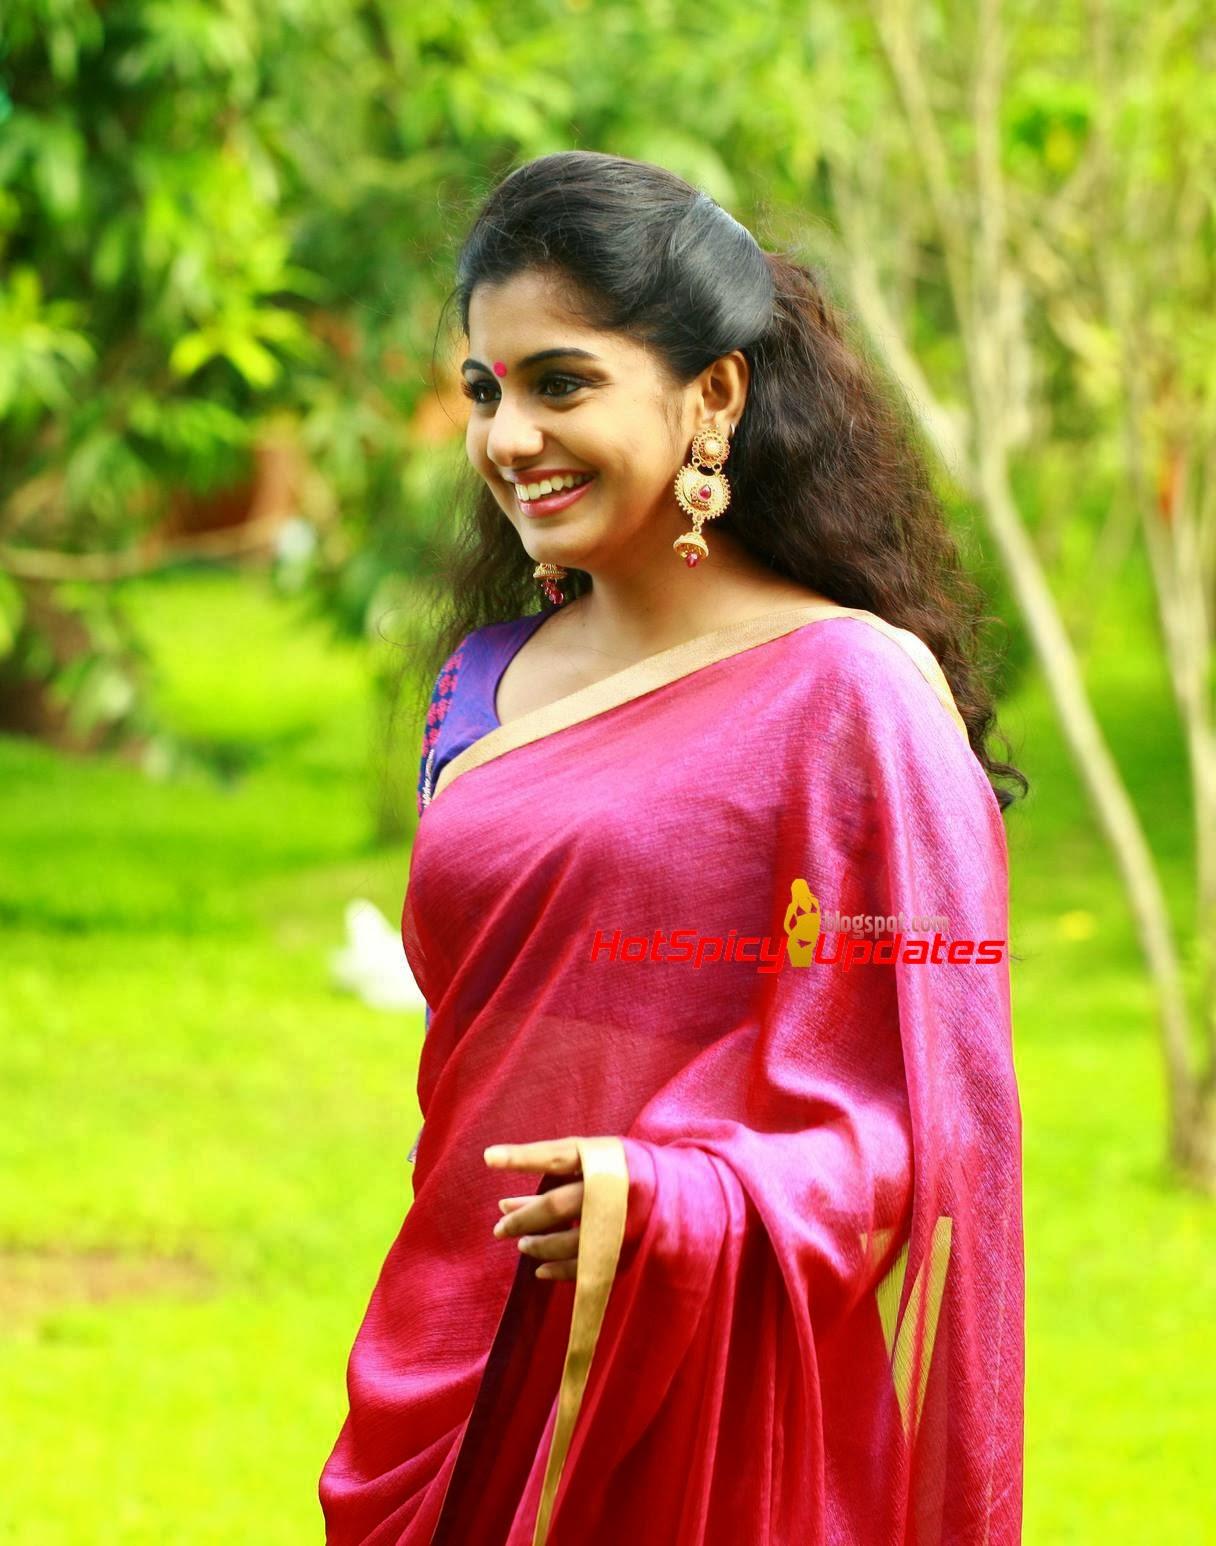 Anju on top - 1 part 4